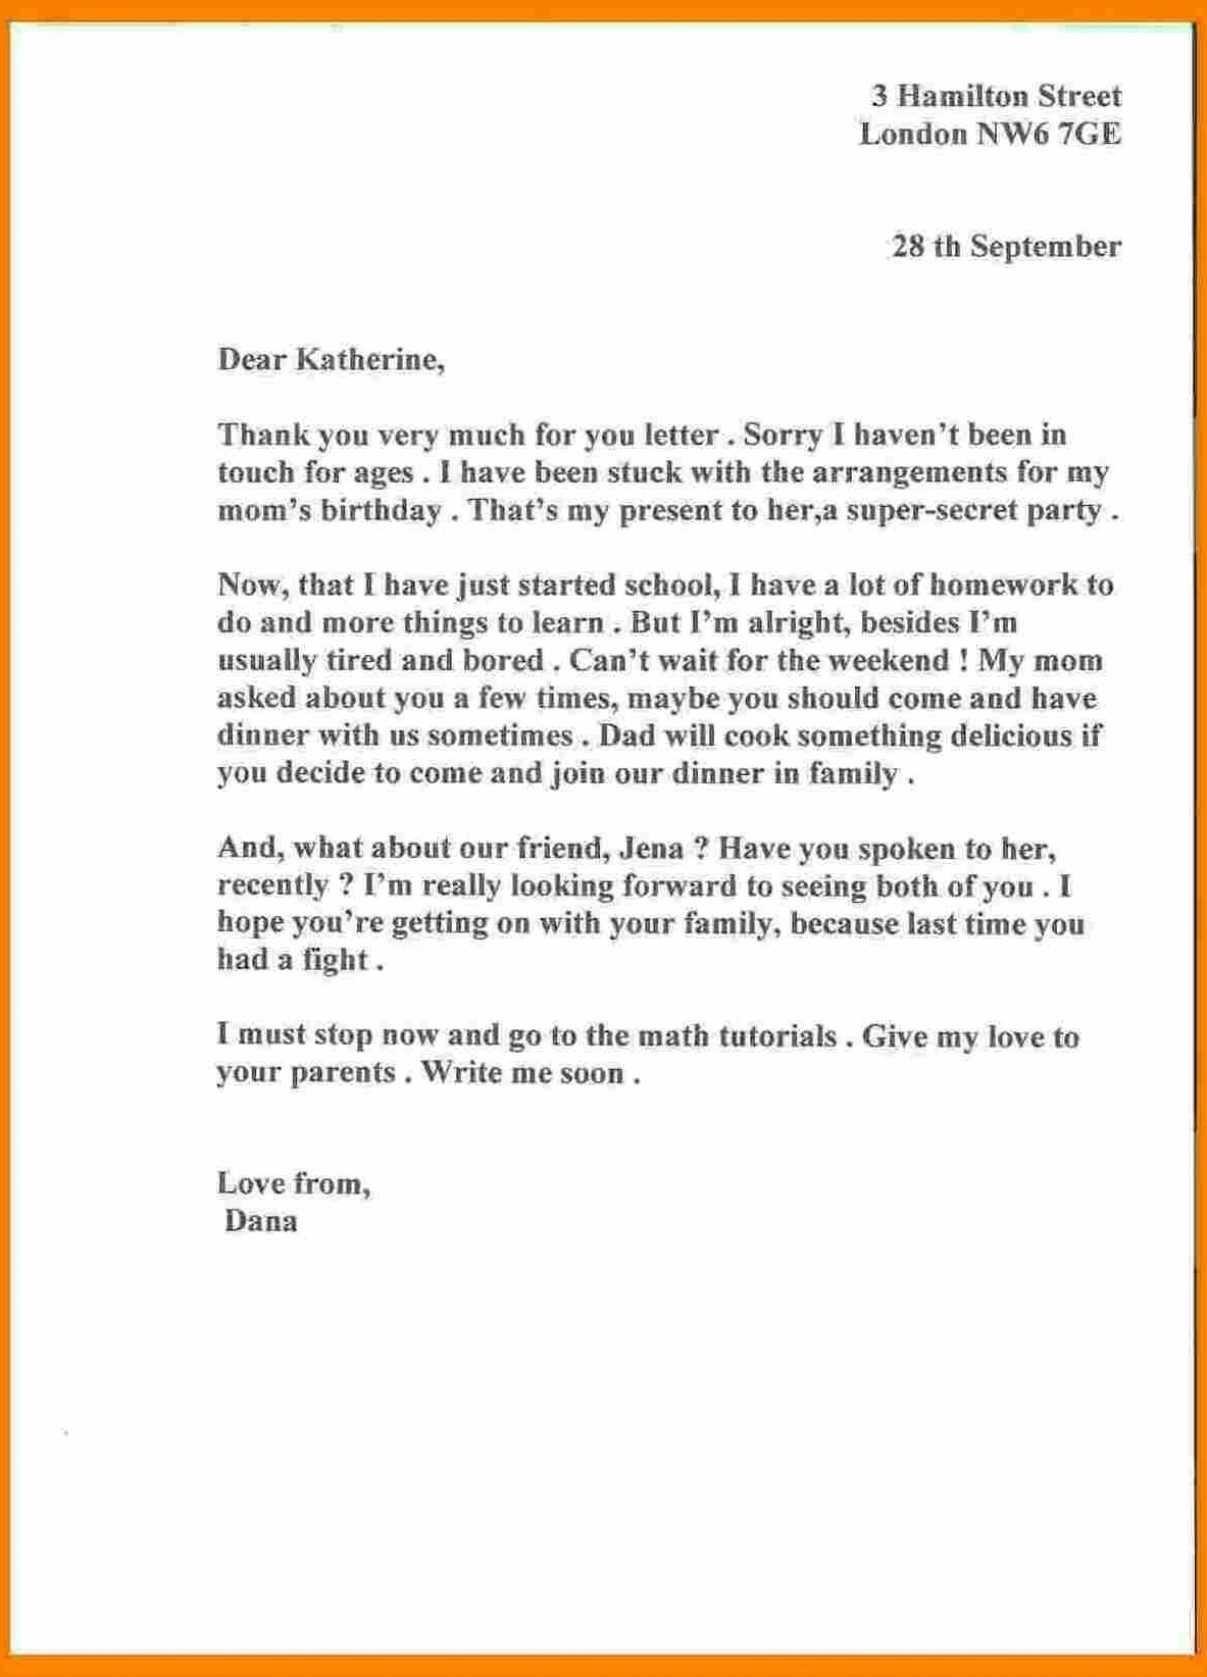 Love Letter Template Download - Simple Love Letter format Save format Love Letter In Marathi Save